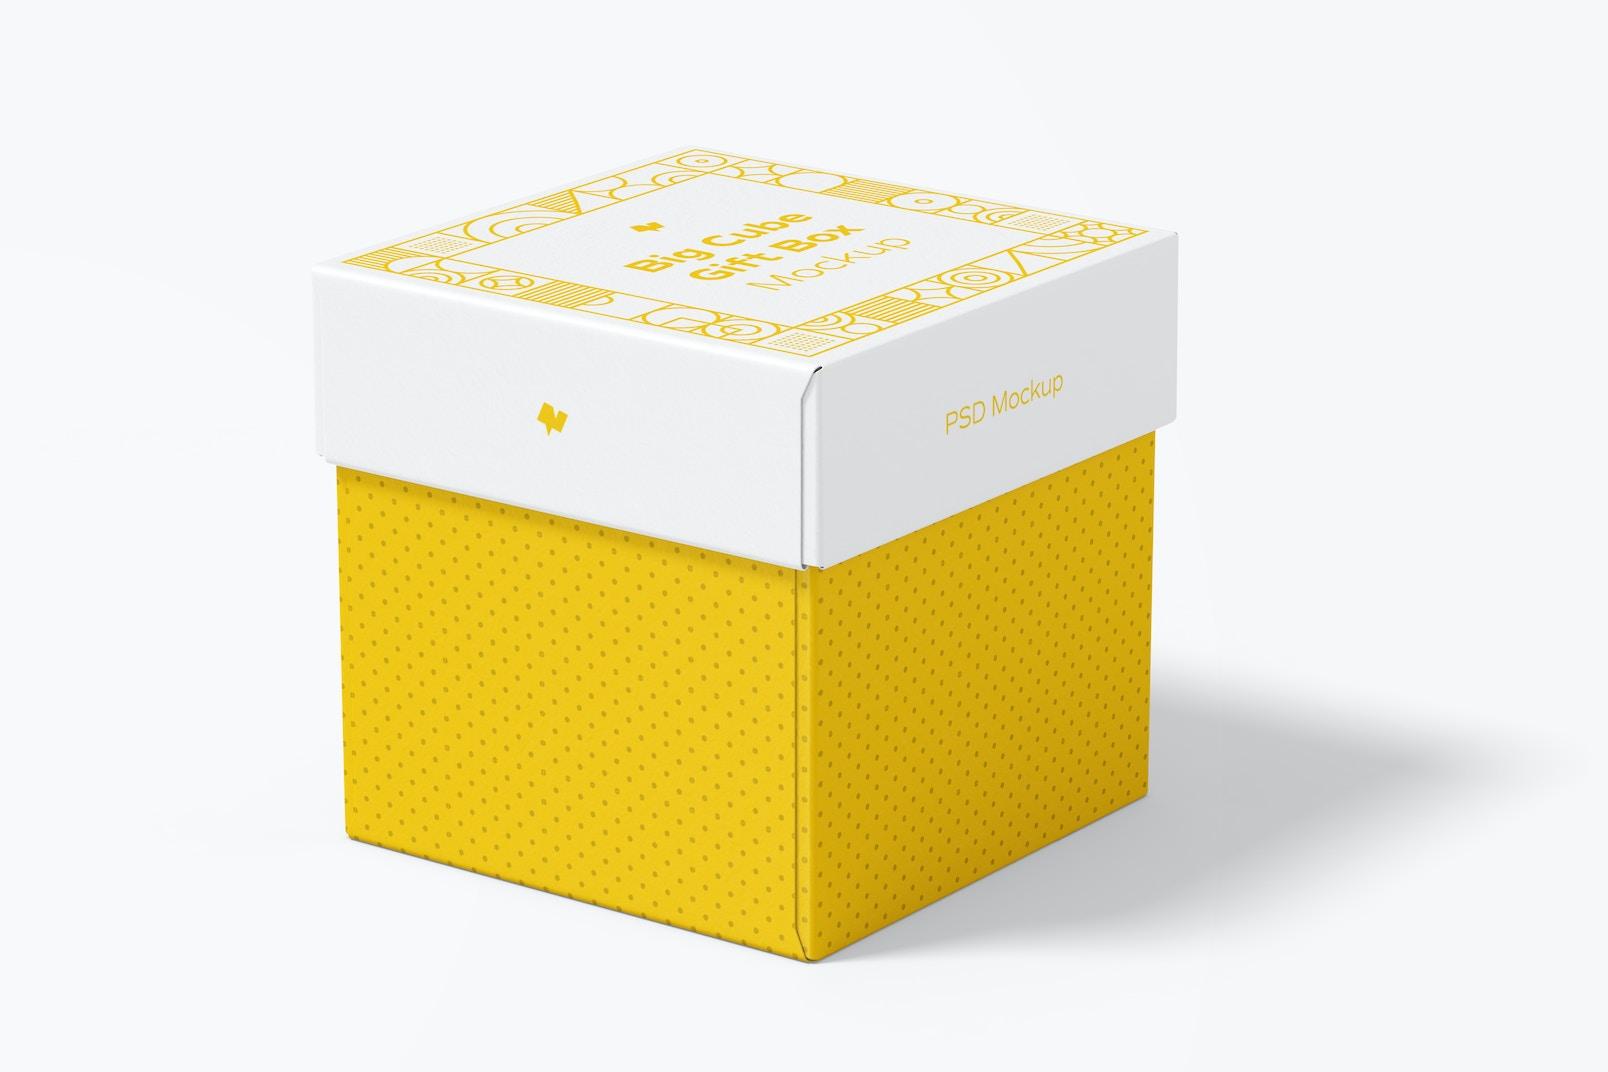 Big Cube Gift Box Mockup